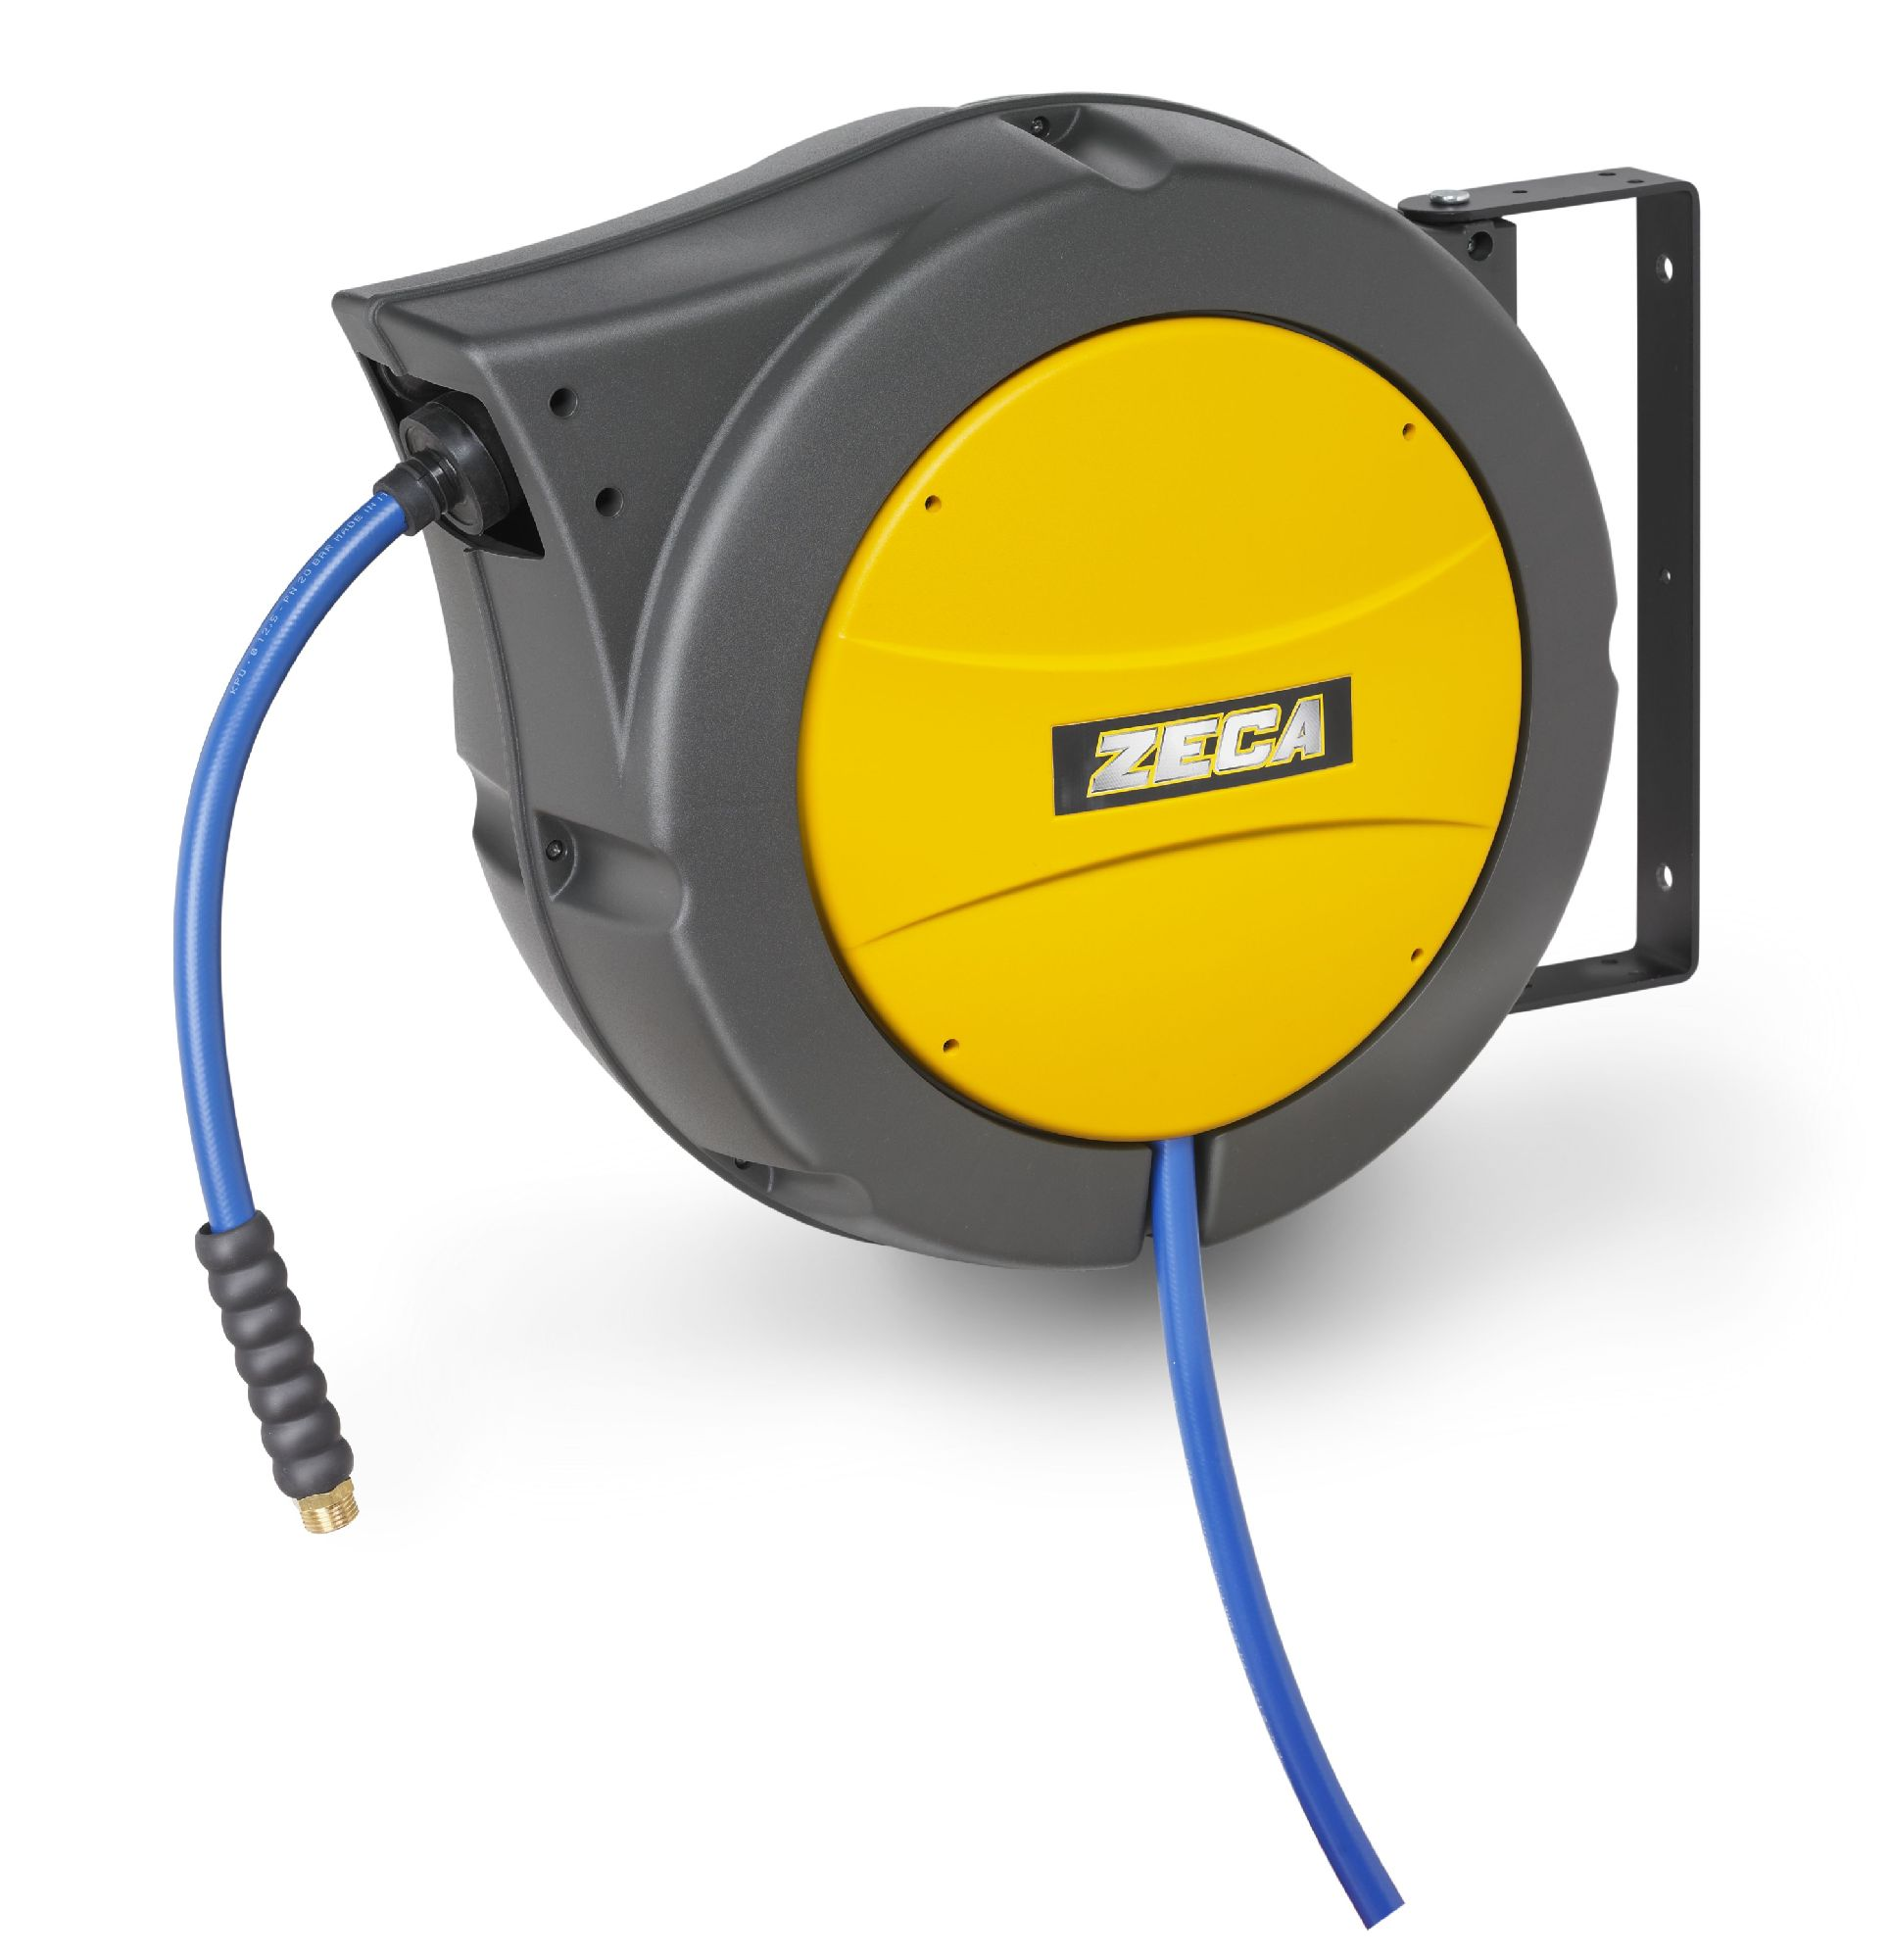 ZELUAM86/10  sc 1 st  Vynckier Tools & ZELUAM86/10 | Airhose Reels | Mechanical workshop equipment ...